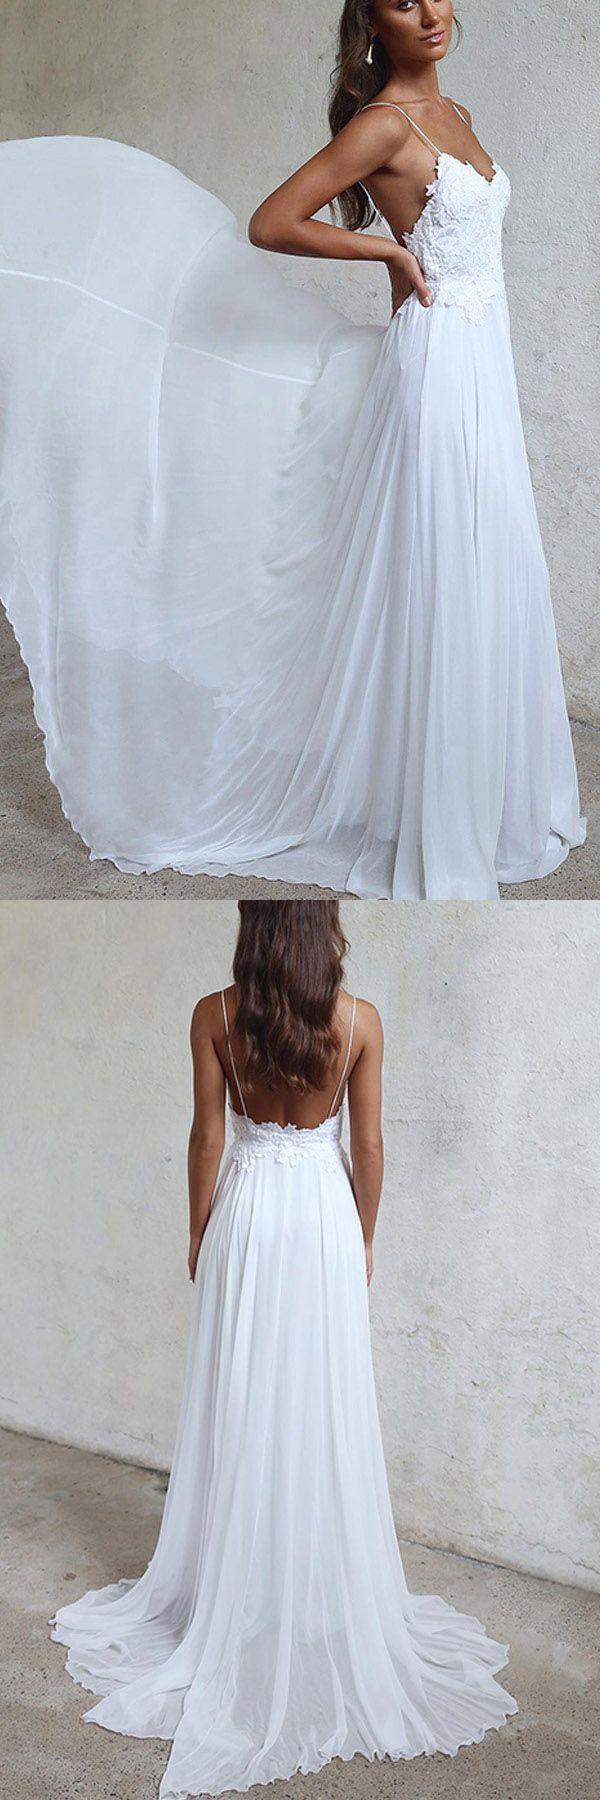 25+ best white beach wedding dresses ideas on pinterest | simple